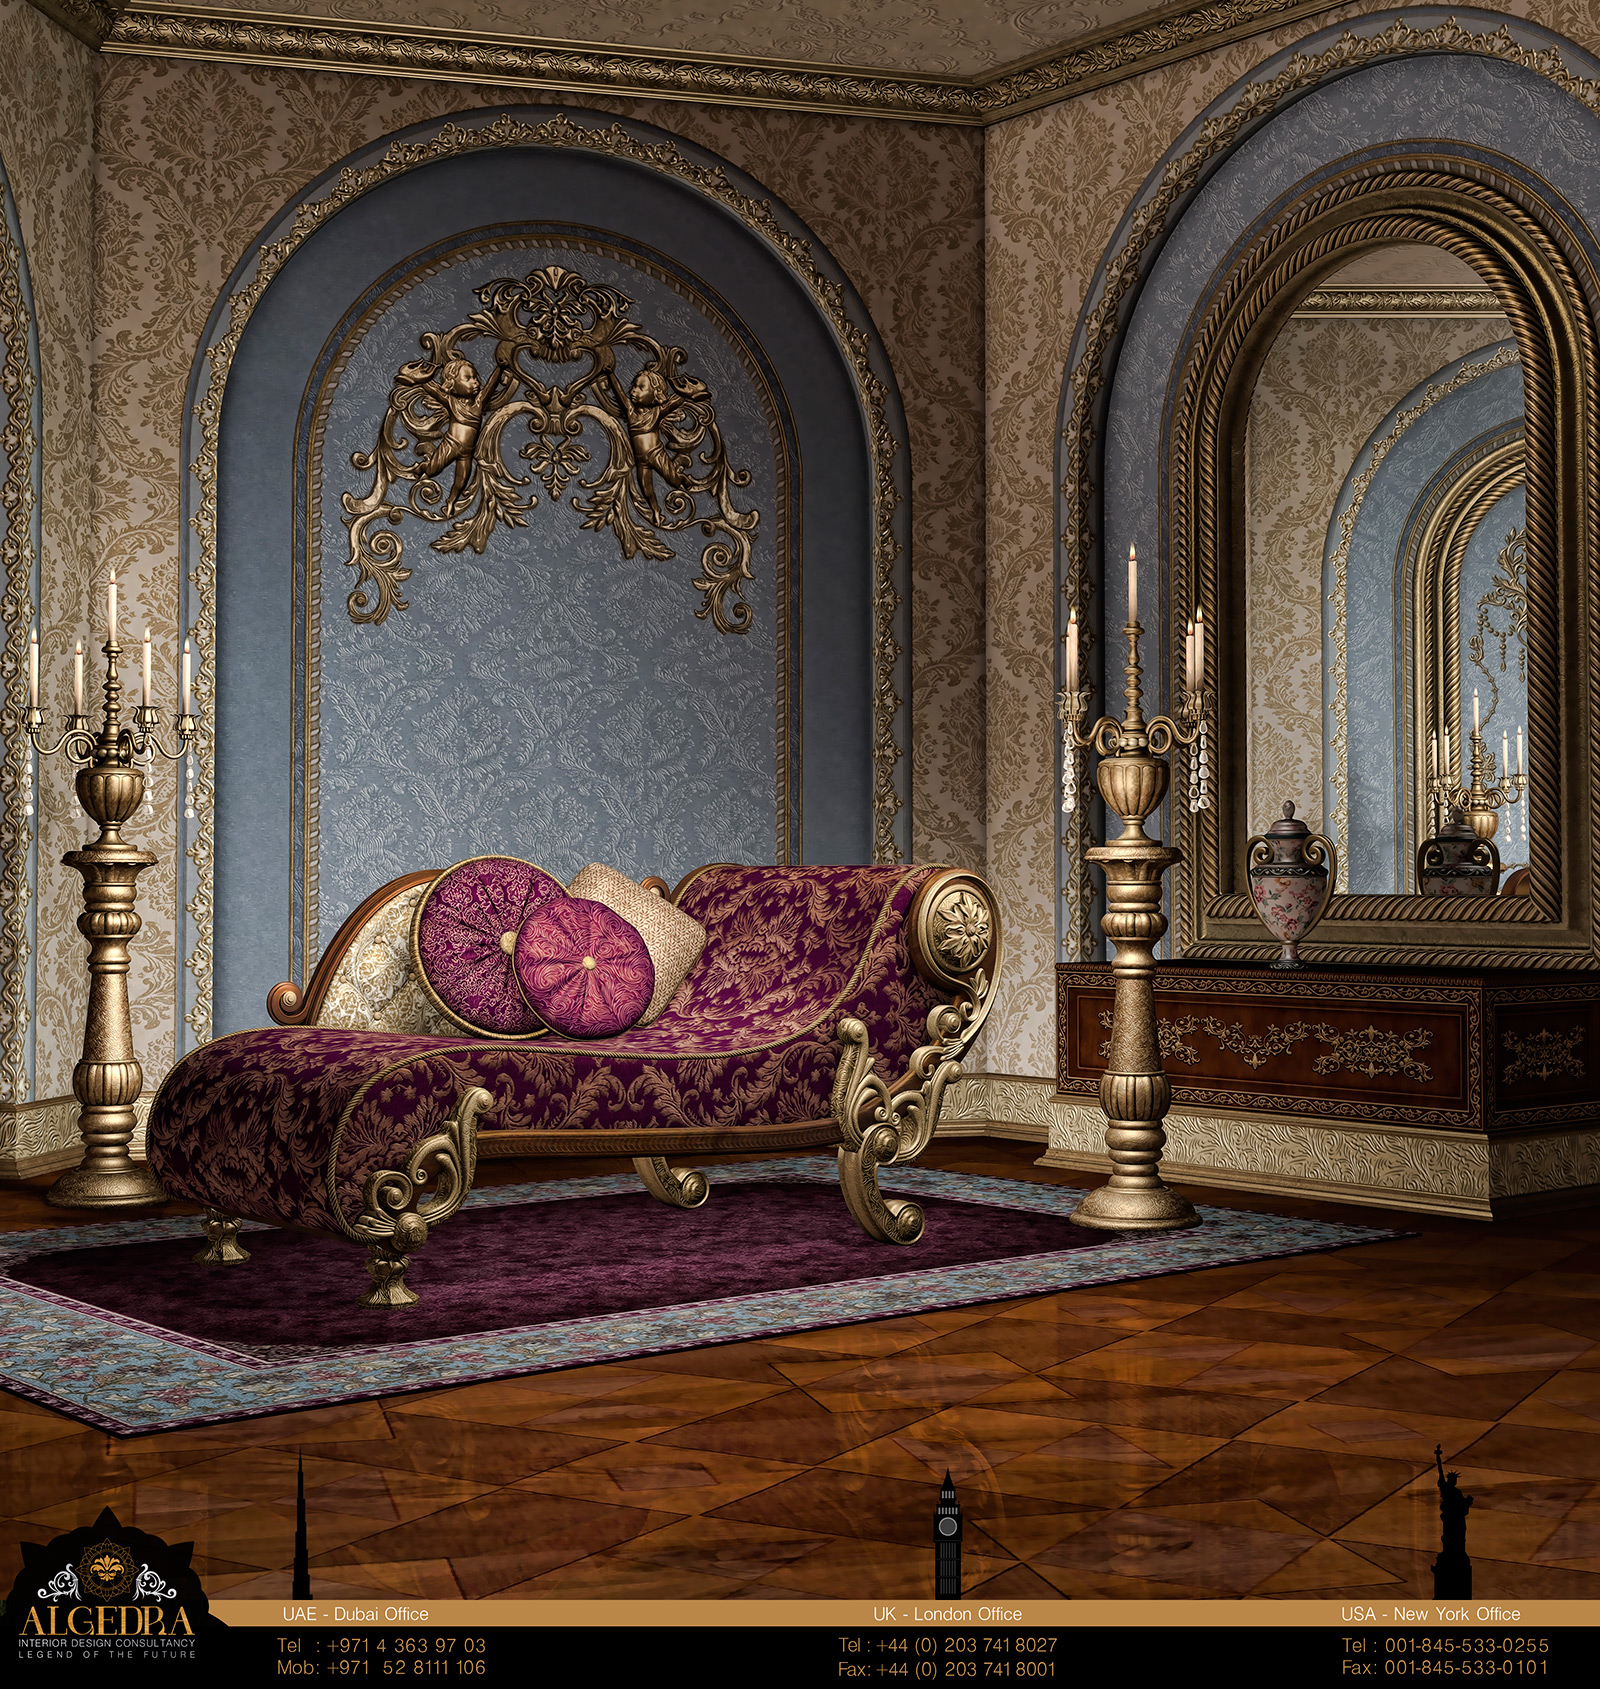 Baroque Style Interior Design Algedra